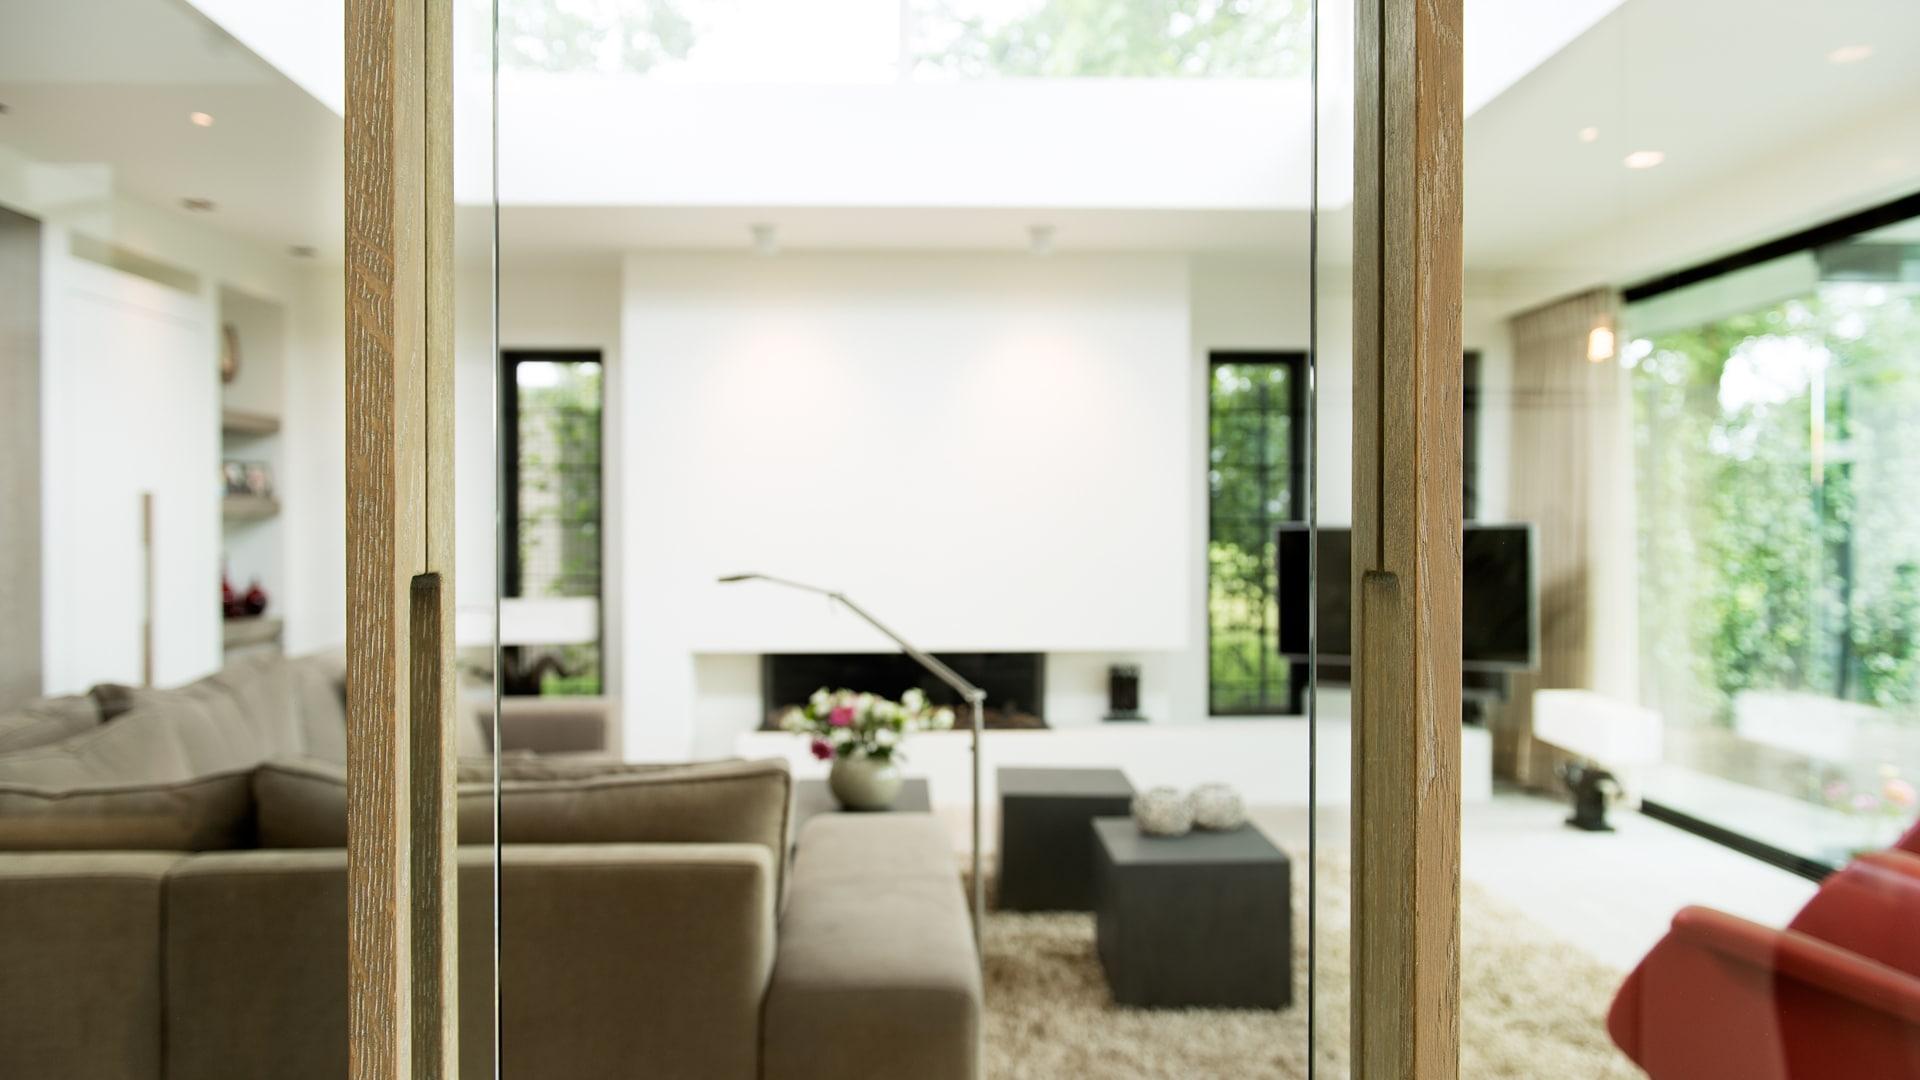 Emejing Schuifdeuren Keuken Woonkamer Ideas - Moderne huis ...